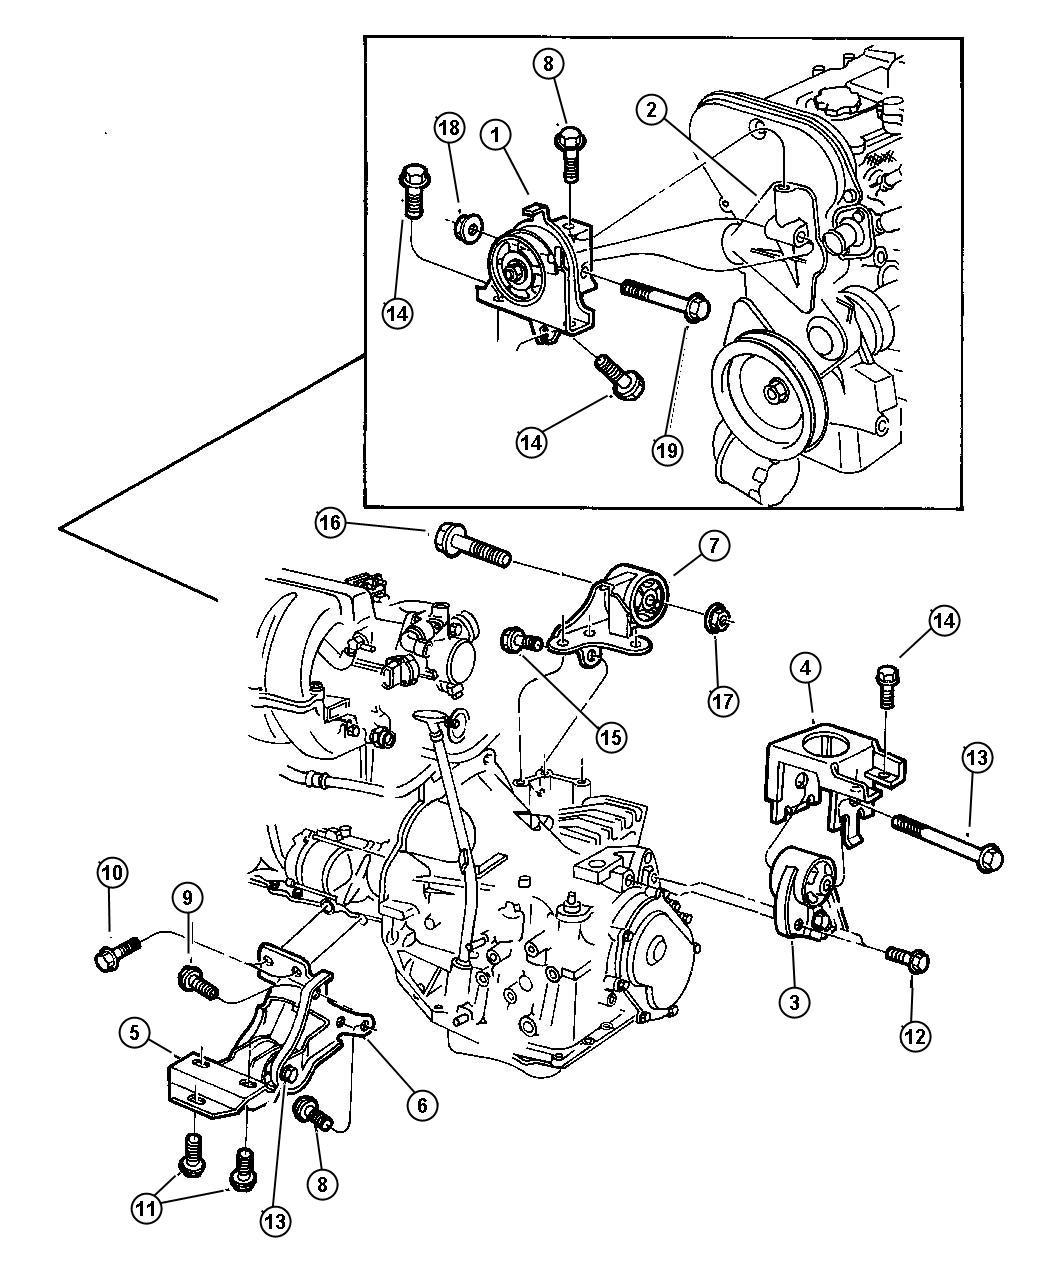 Dodge Caravan Support. Engine mount. Right. Engine mount